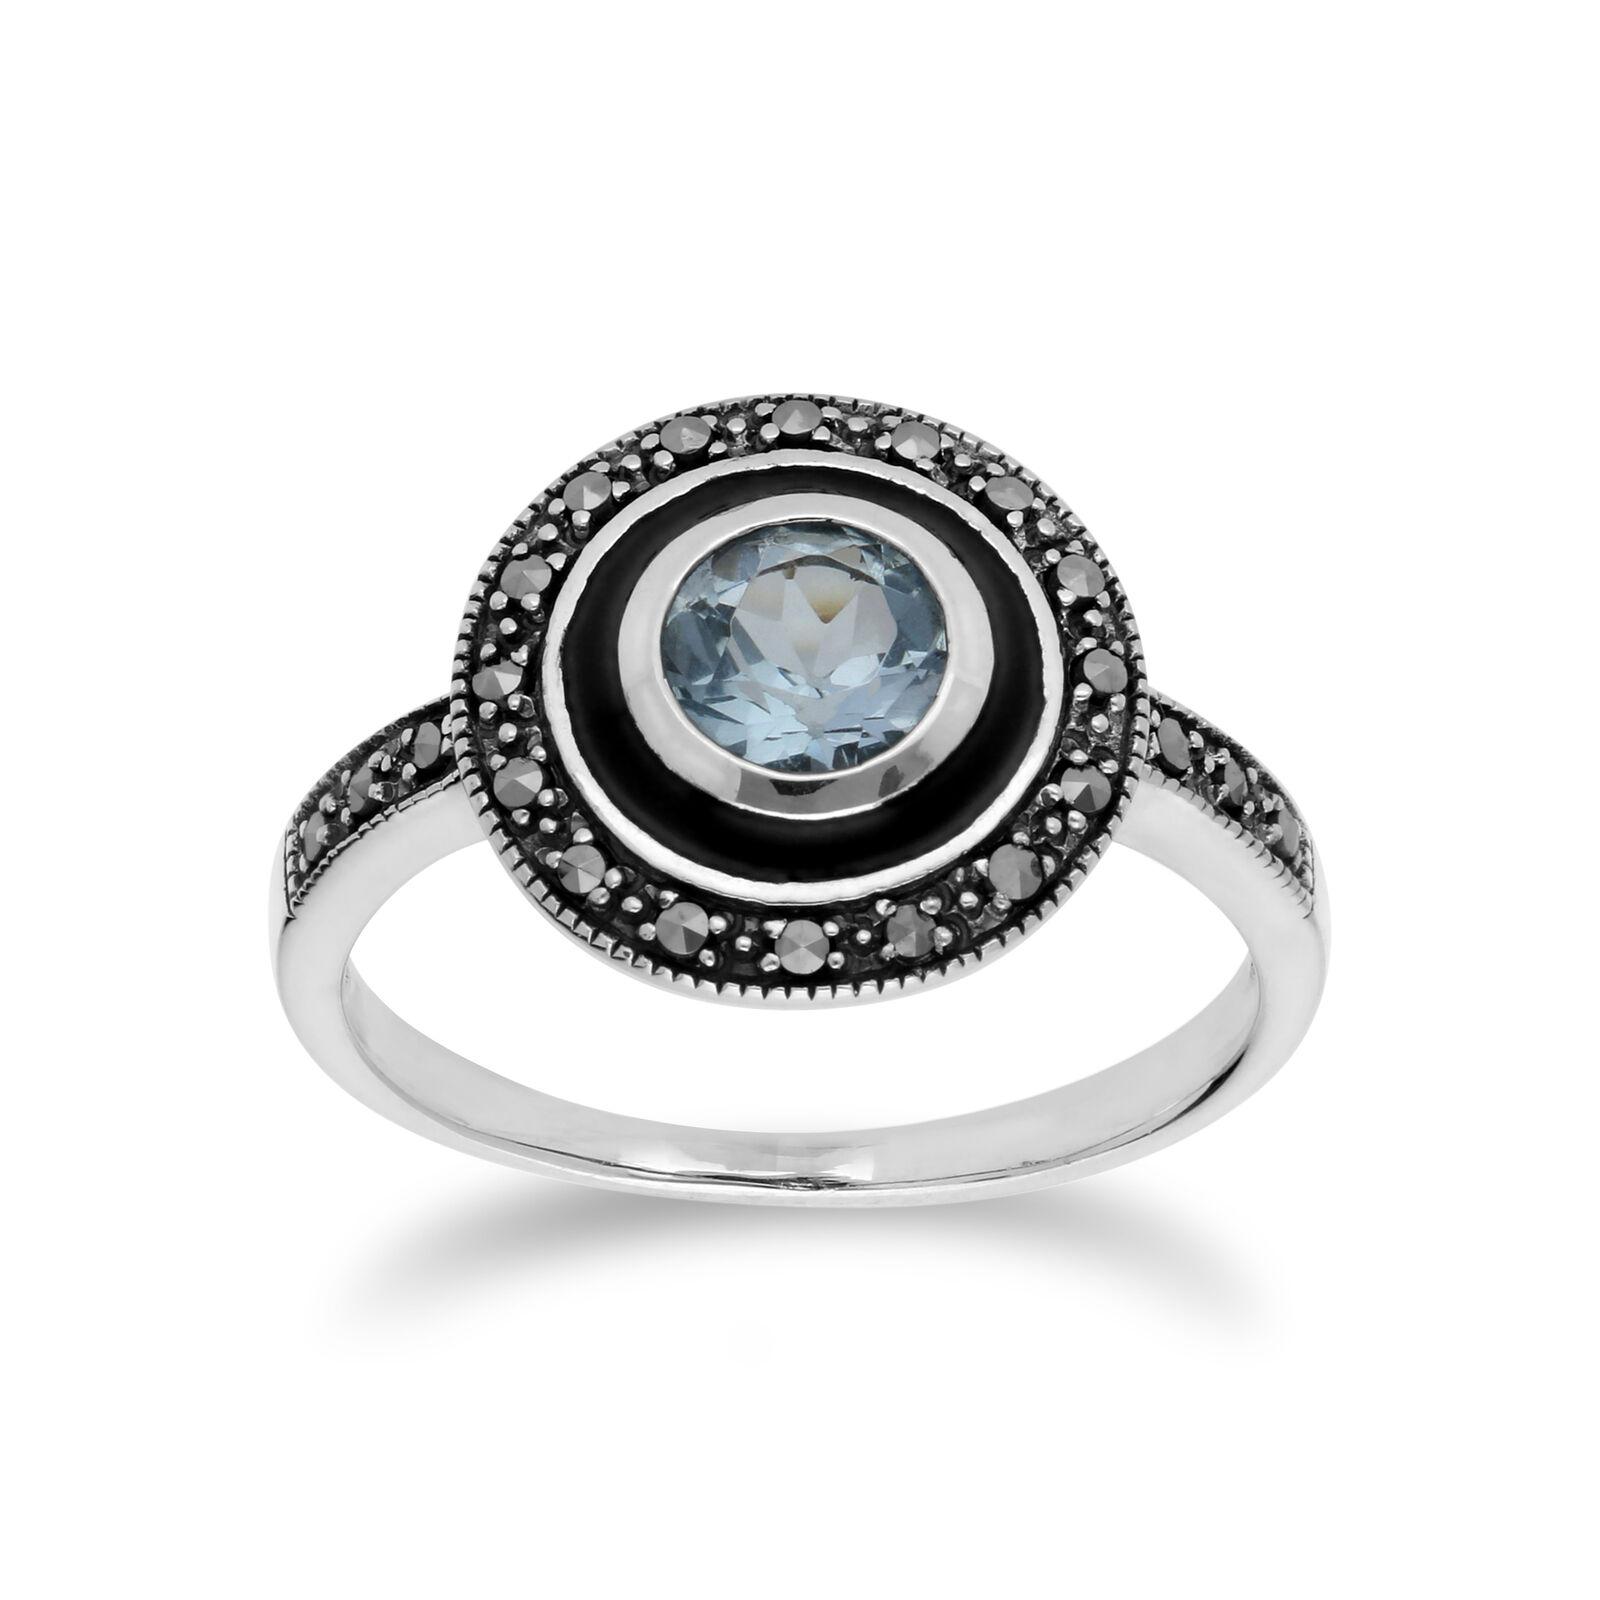 Gemondo silver Sterling Topaze blue & Marcassite & Émail black Bague